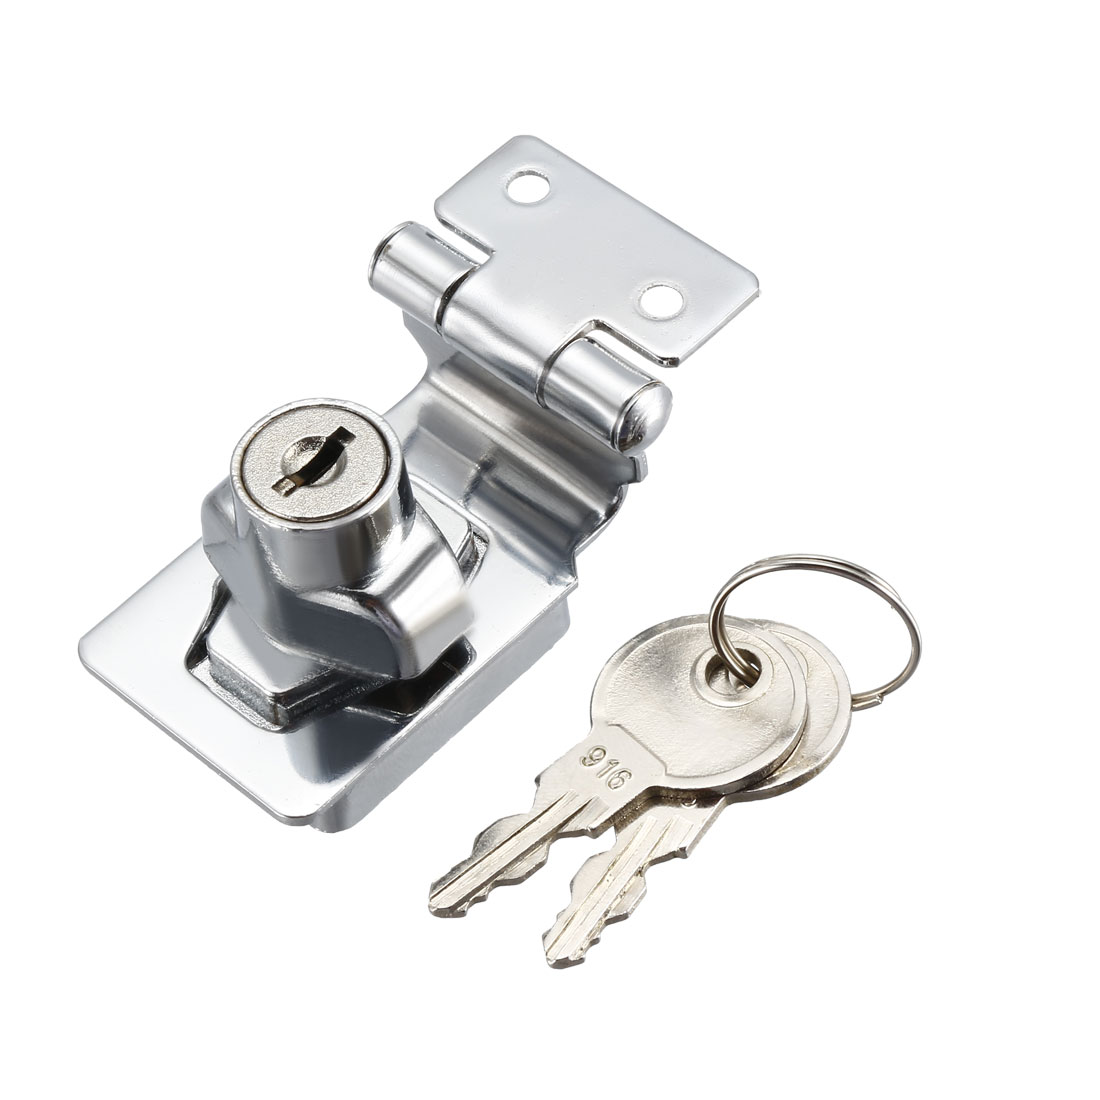 Keyed Hasp Lock 54mm Twist Knob Keyed Locking Hasp for Door Cabinet